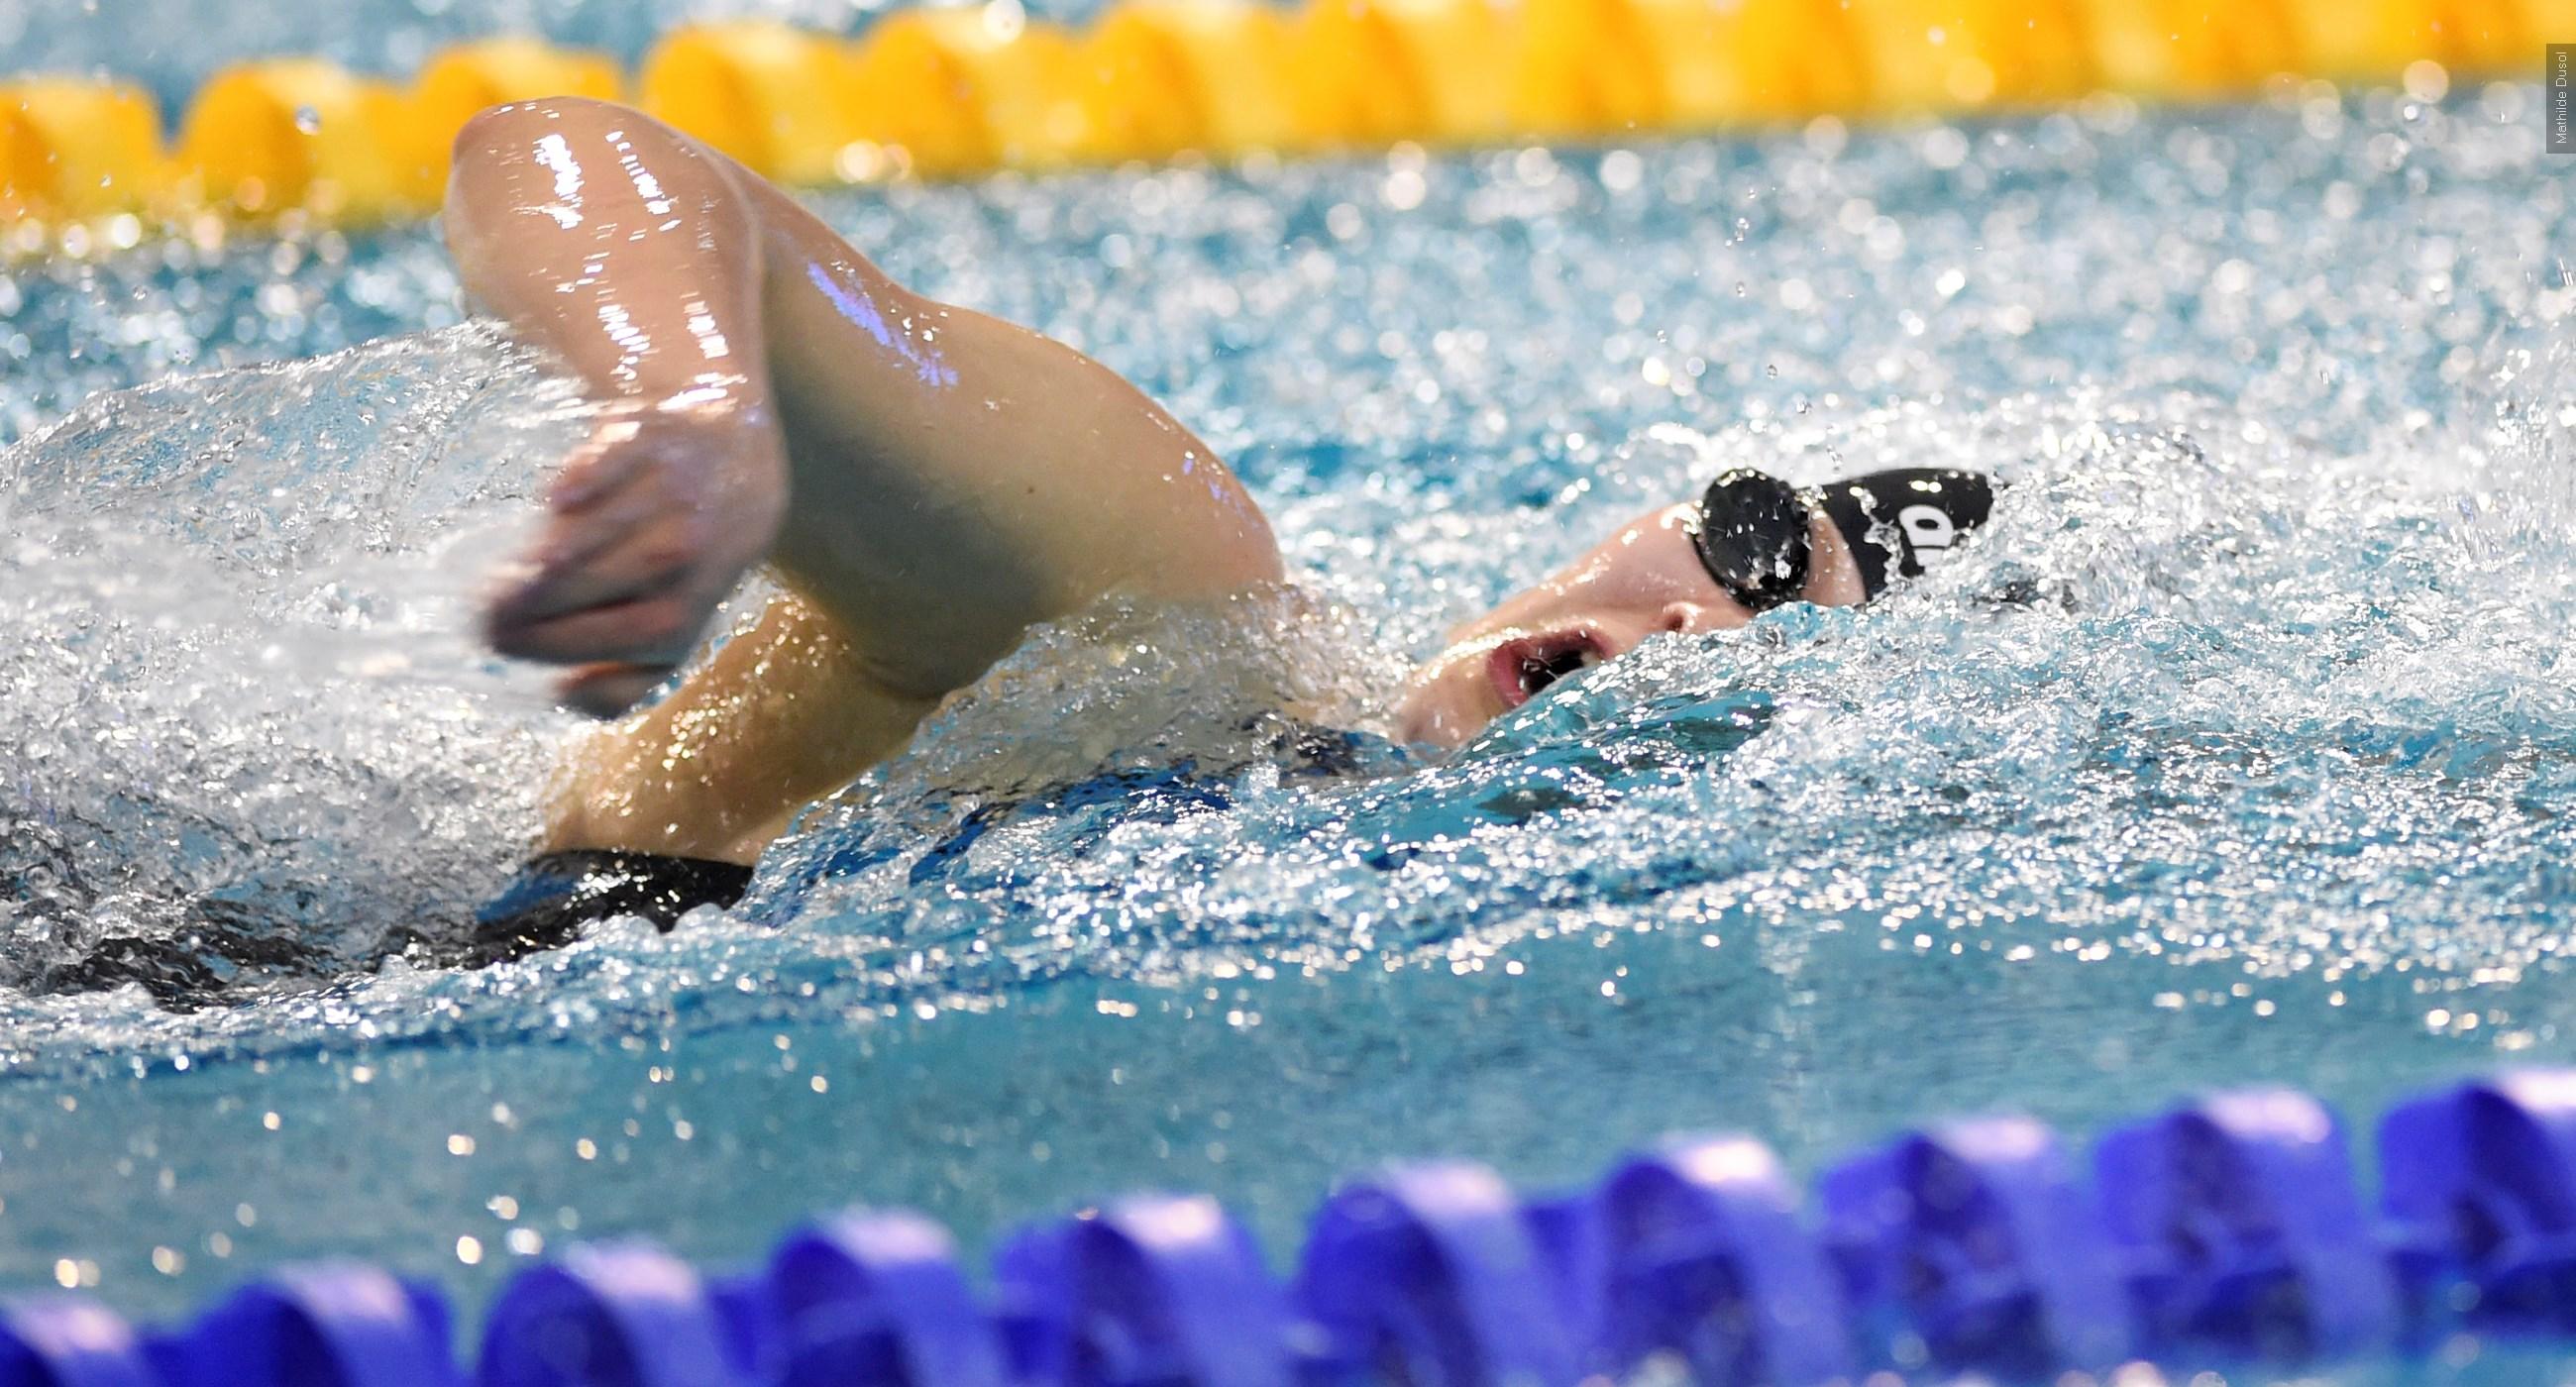 Liesette Bruinsma verbetert wereldrecord 50 meter vrij